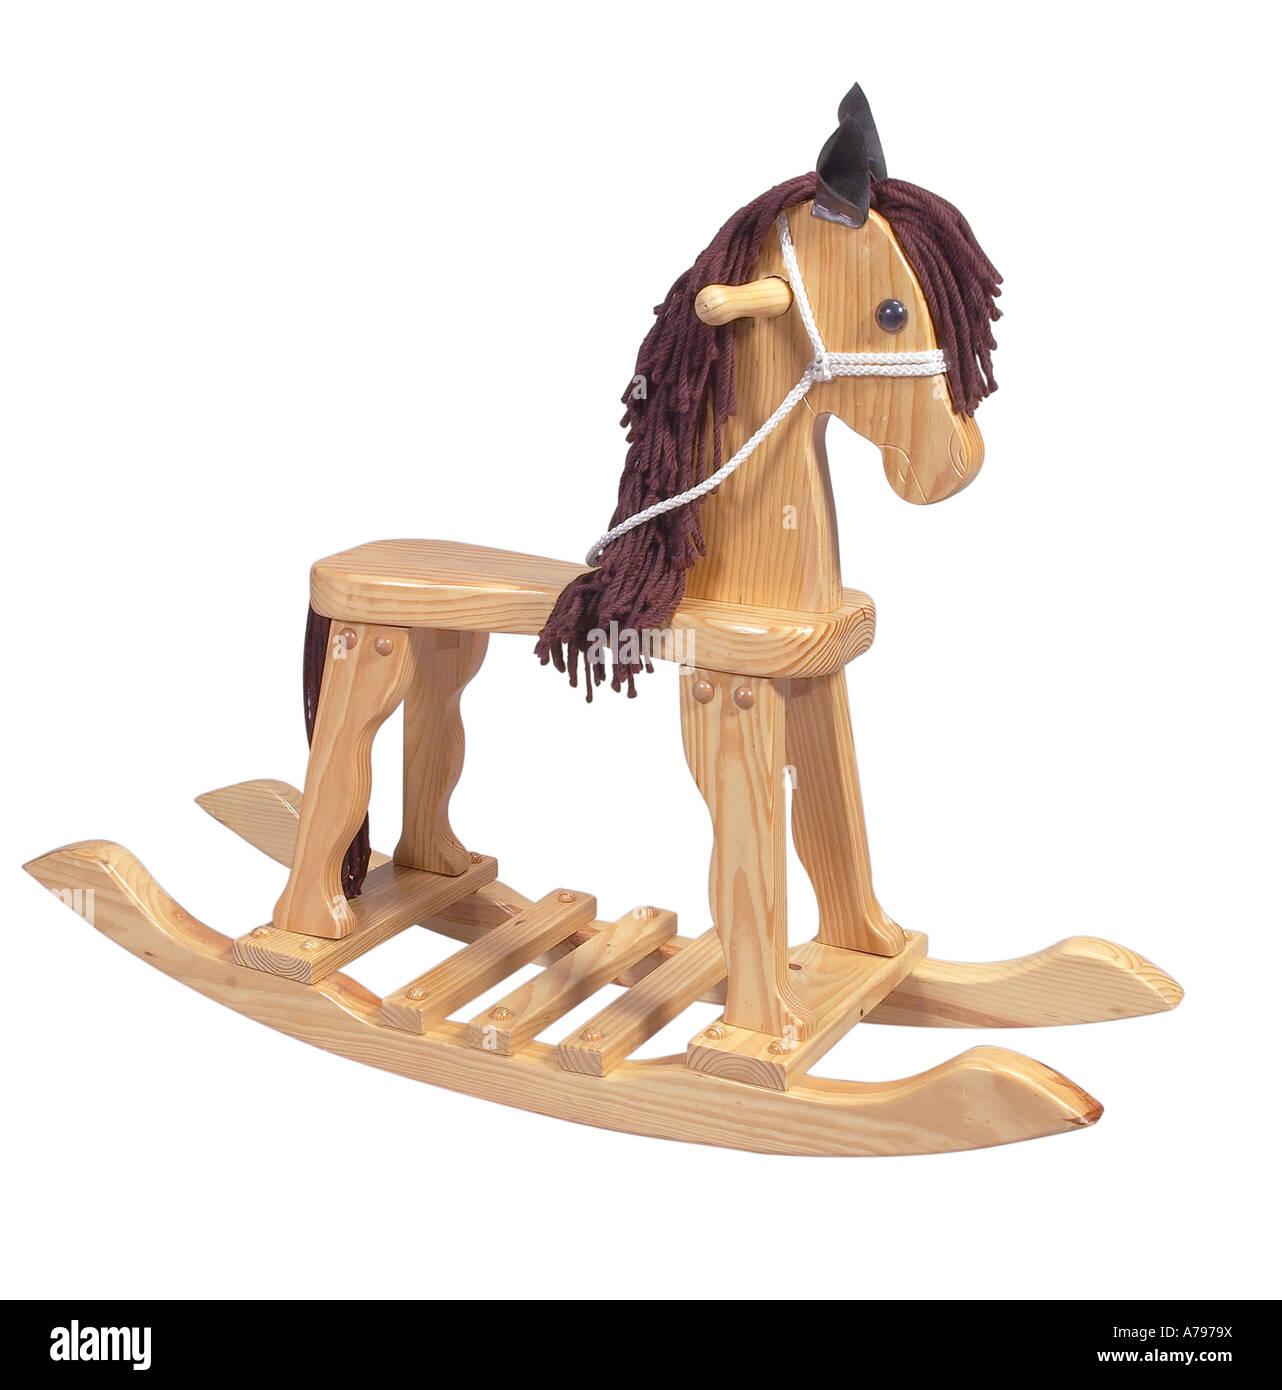 Wooden Rocking Horse Studio Still Life White Background - Stock Image